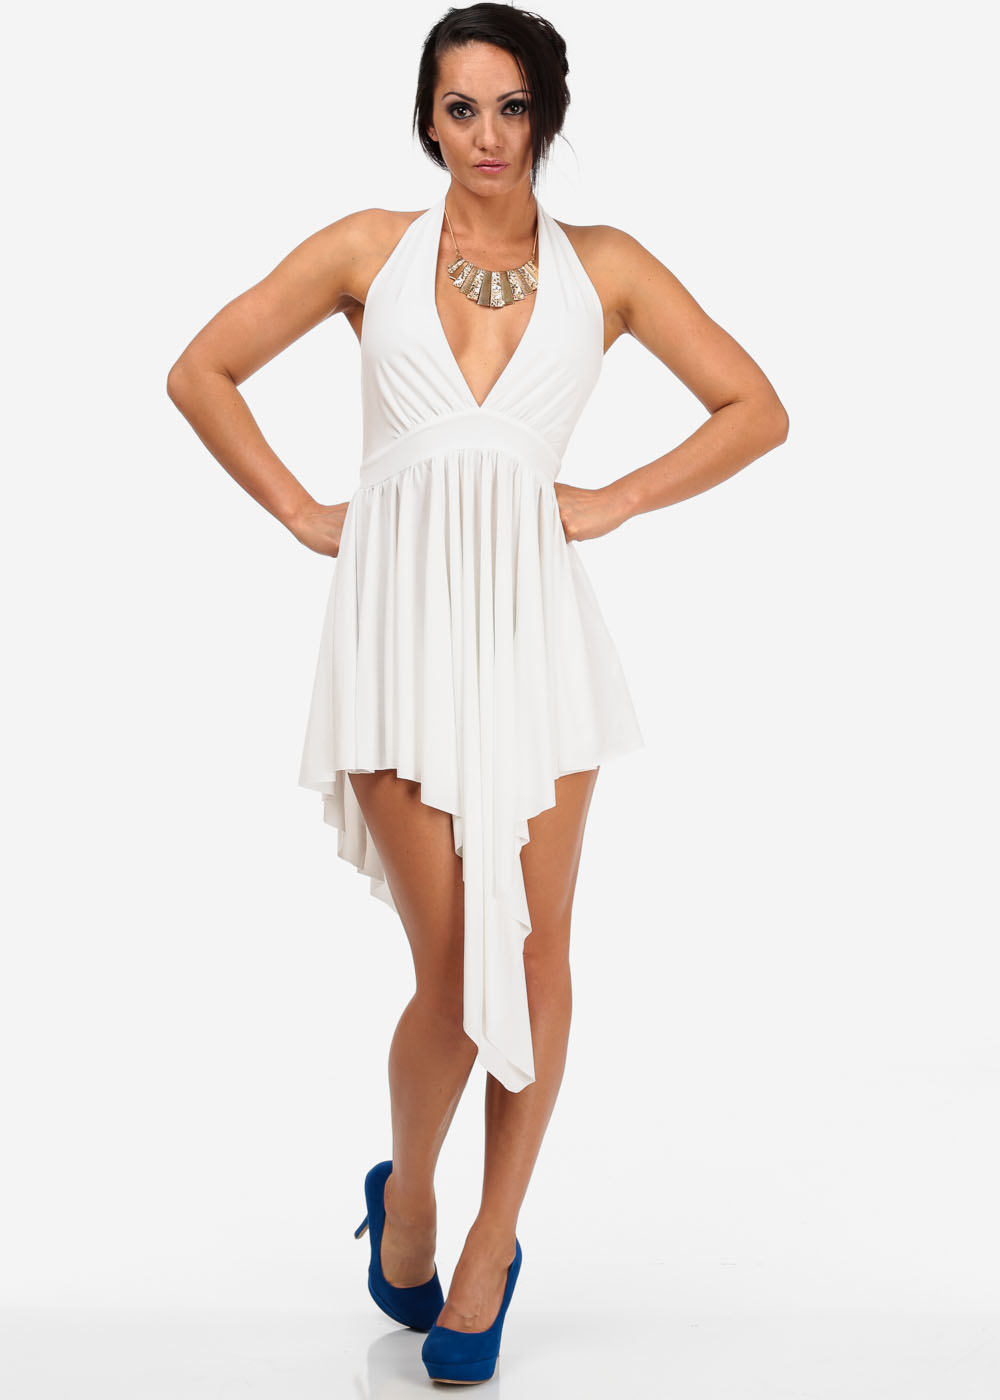 Fashion Dresses-Cute Halter Dress- Egg shell sexy dress